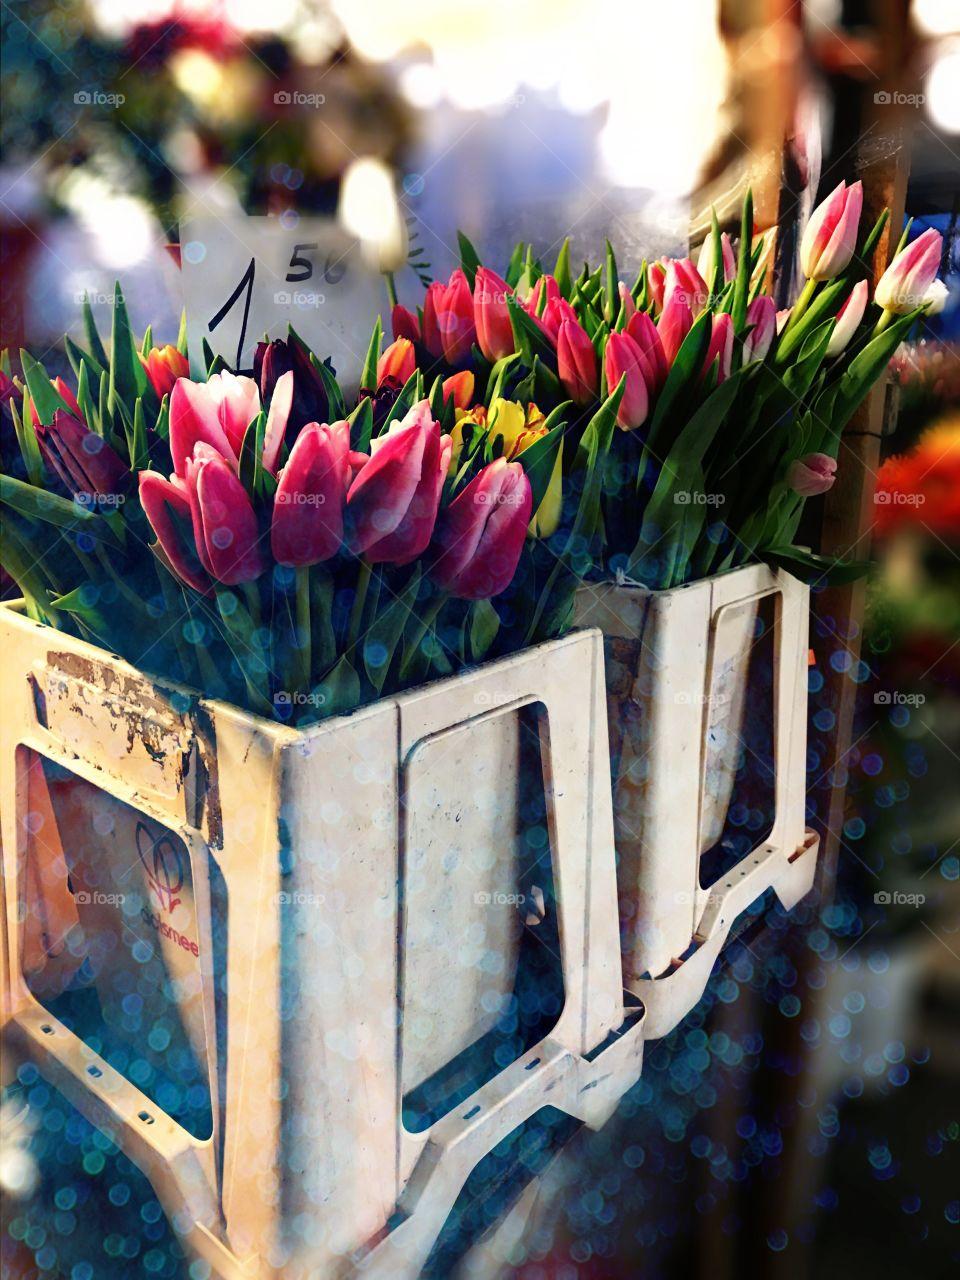 Tulip flowers in market for sale